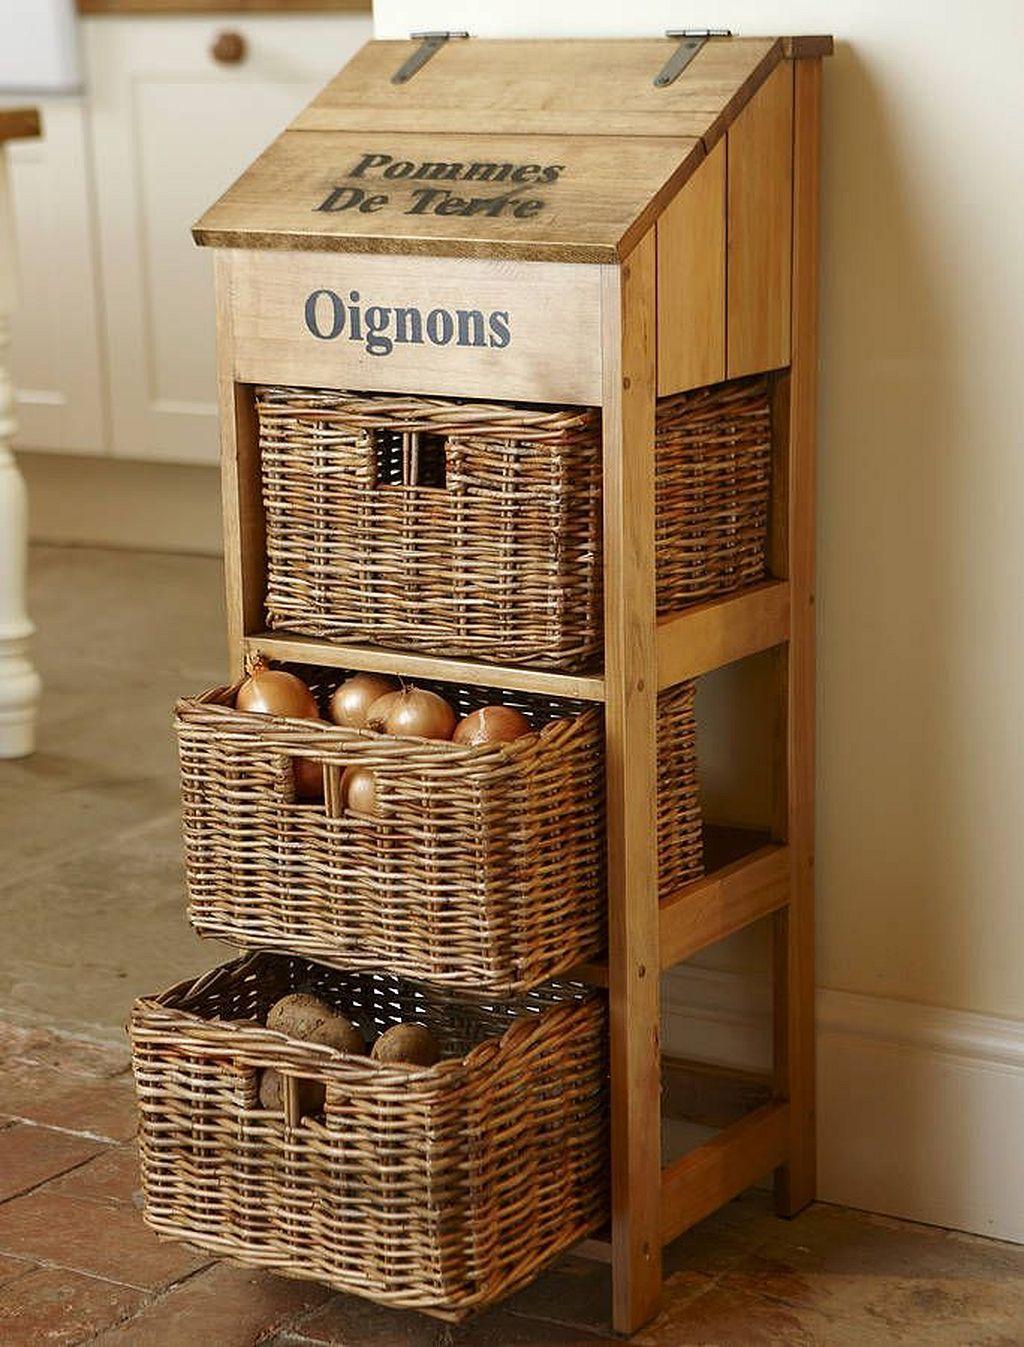 35 brilliant onion storage for your kitchen ideas   onion storage